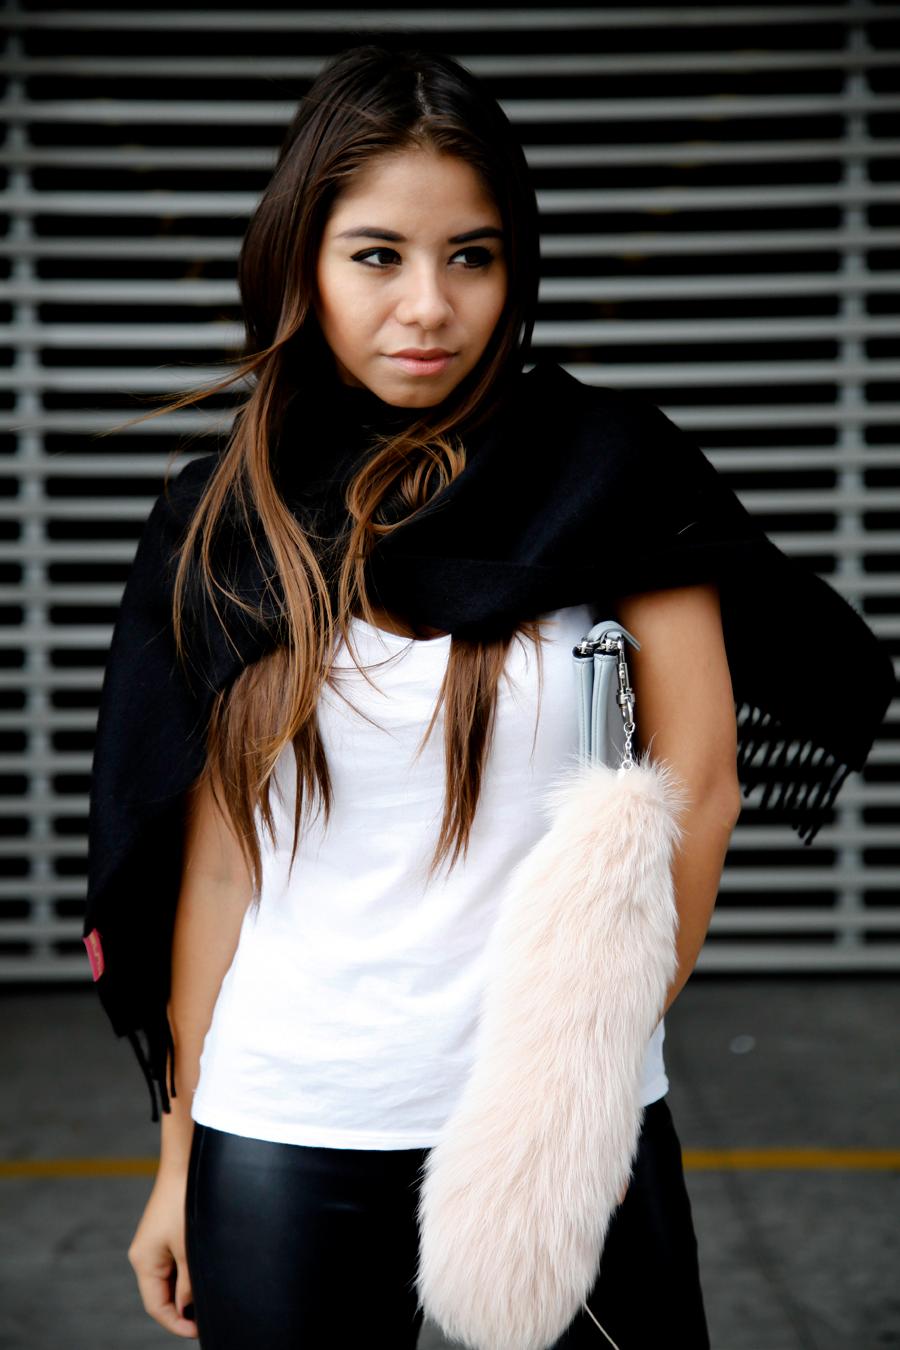 Fashionrella1